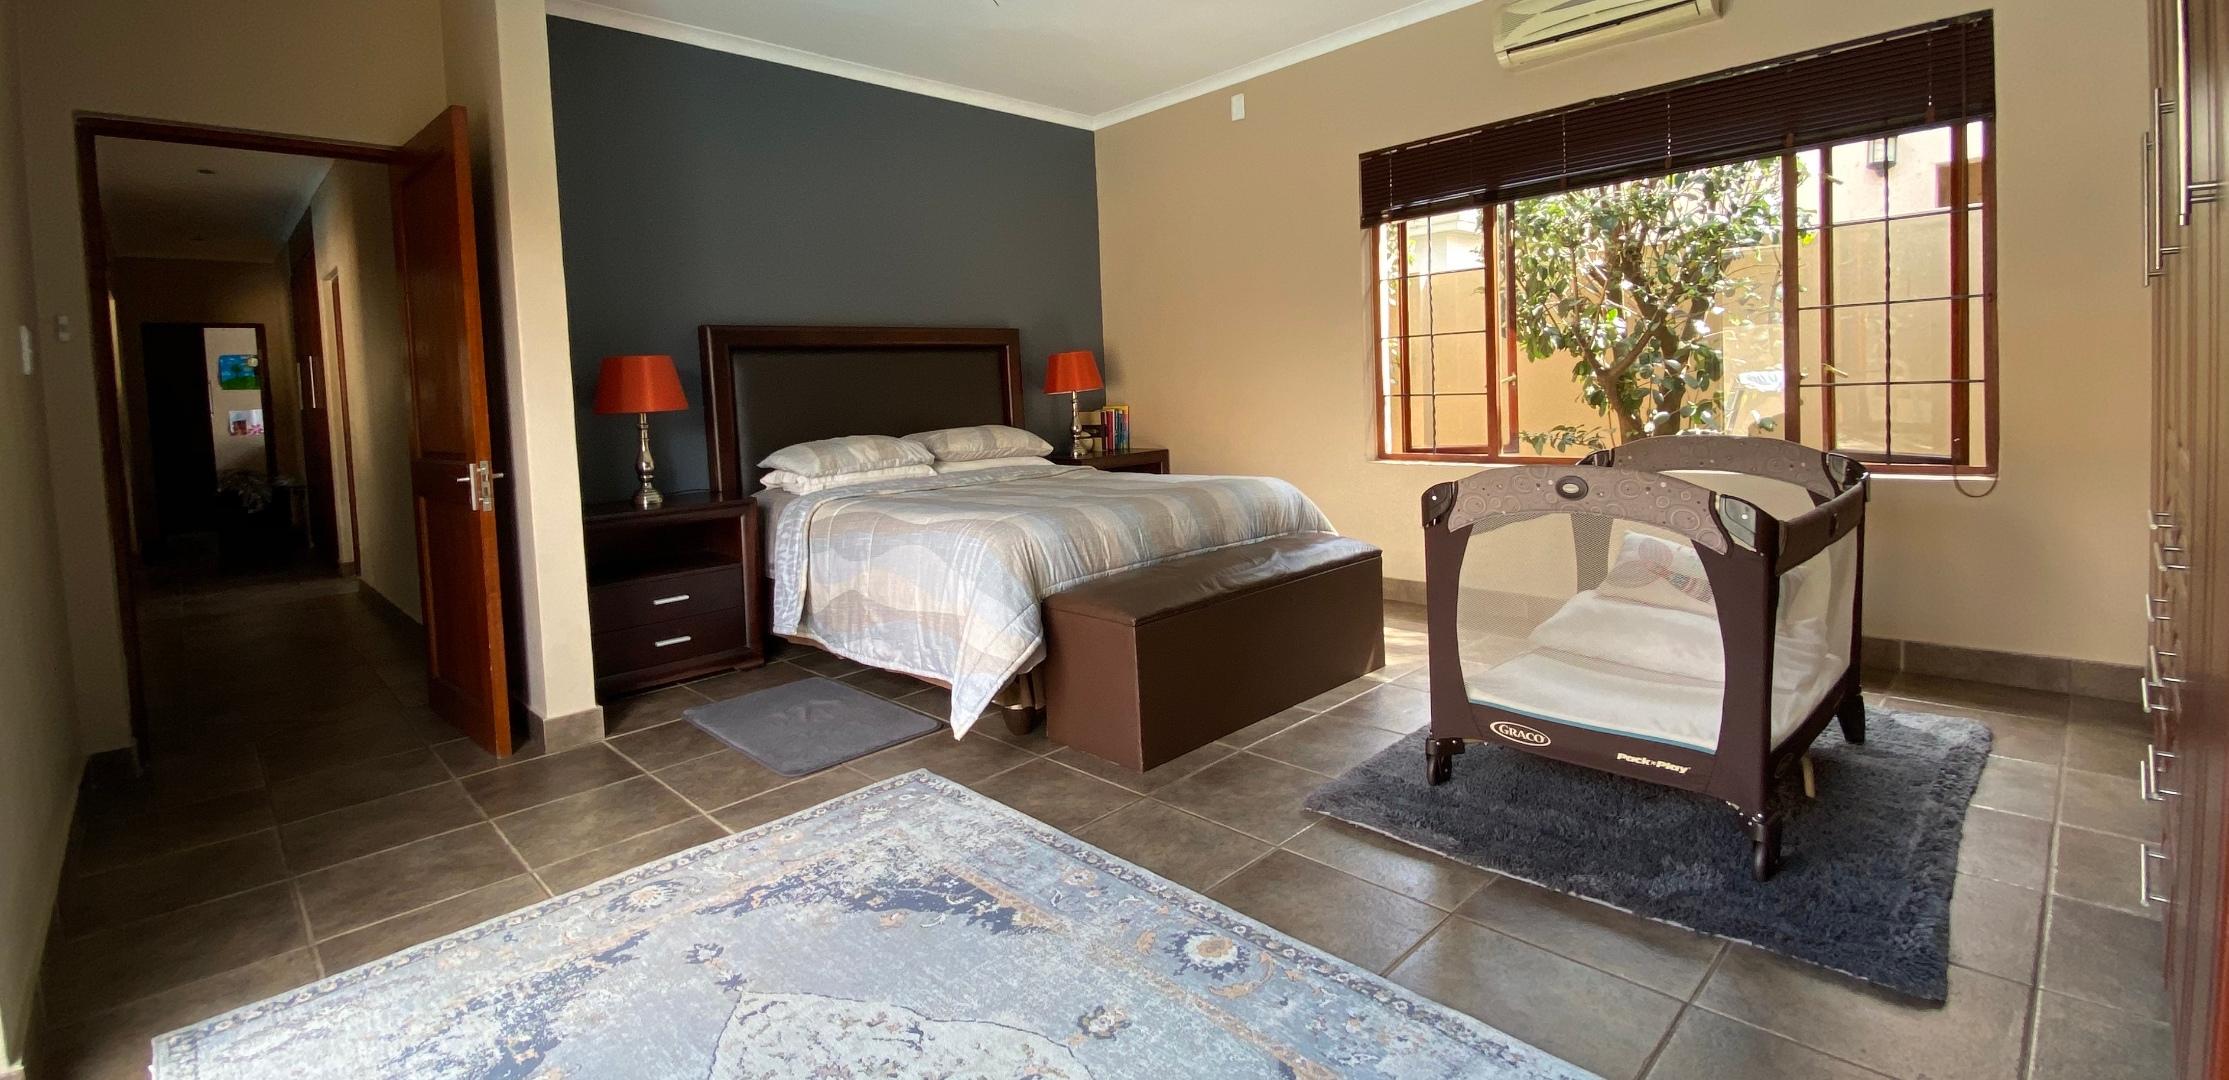 4 Bedroom House For Sale in Leeuwenhof Estate